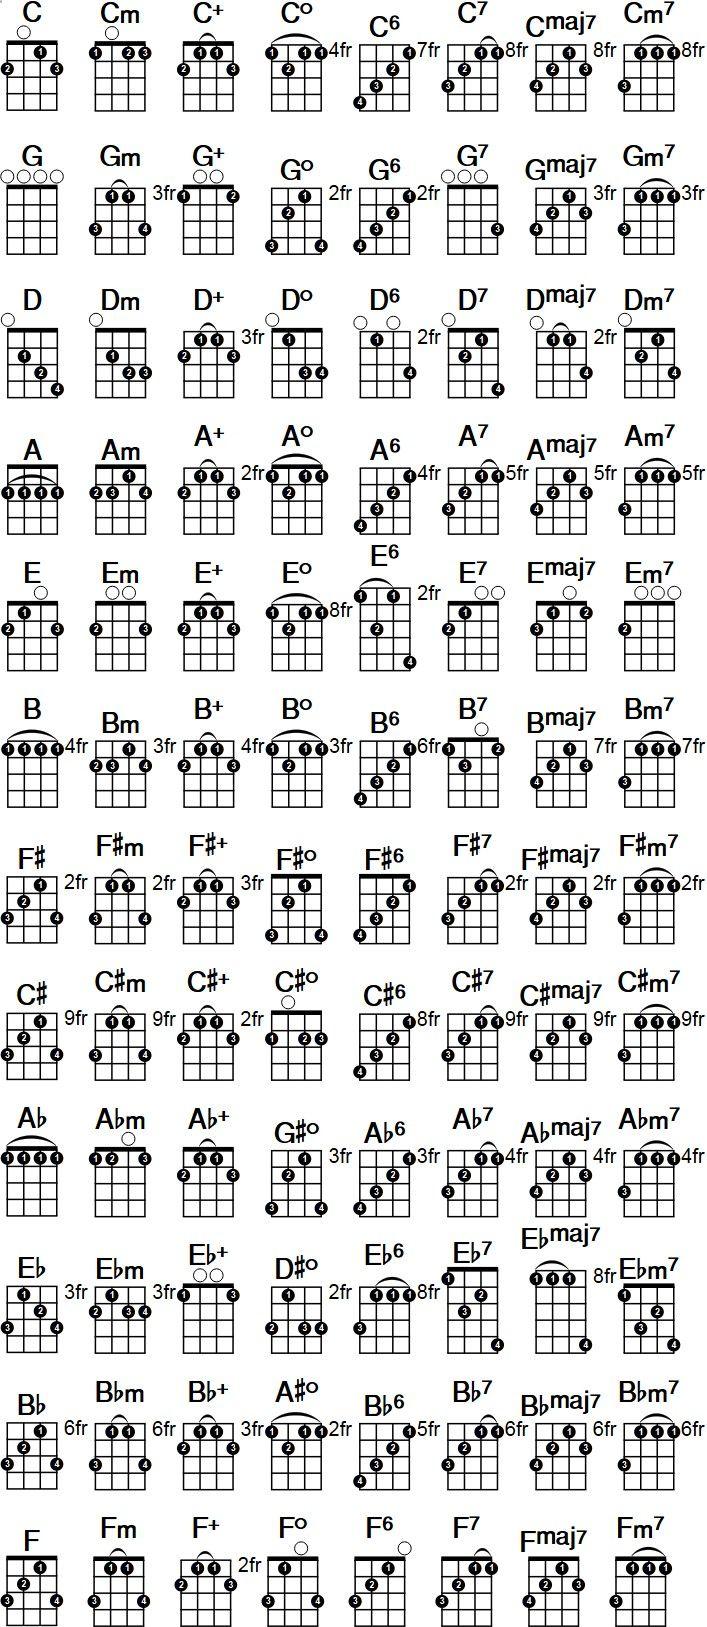 Printable banjo chord chart. Free PDF download at banjochords.net ...